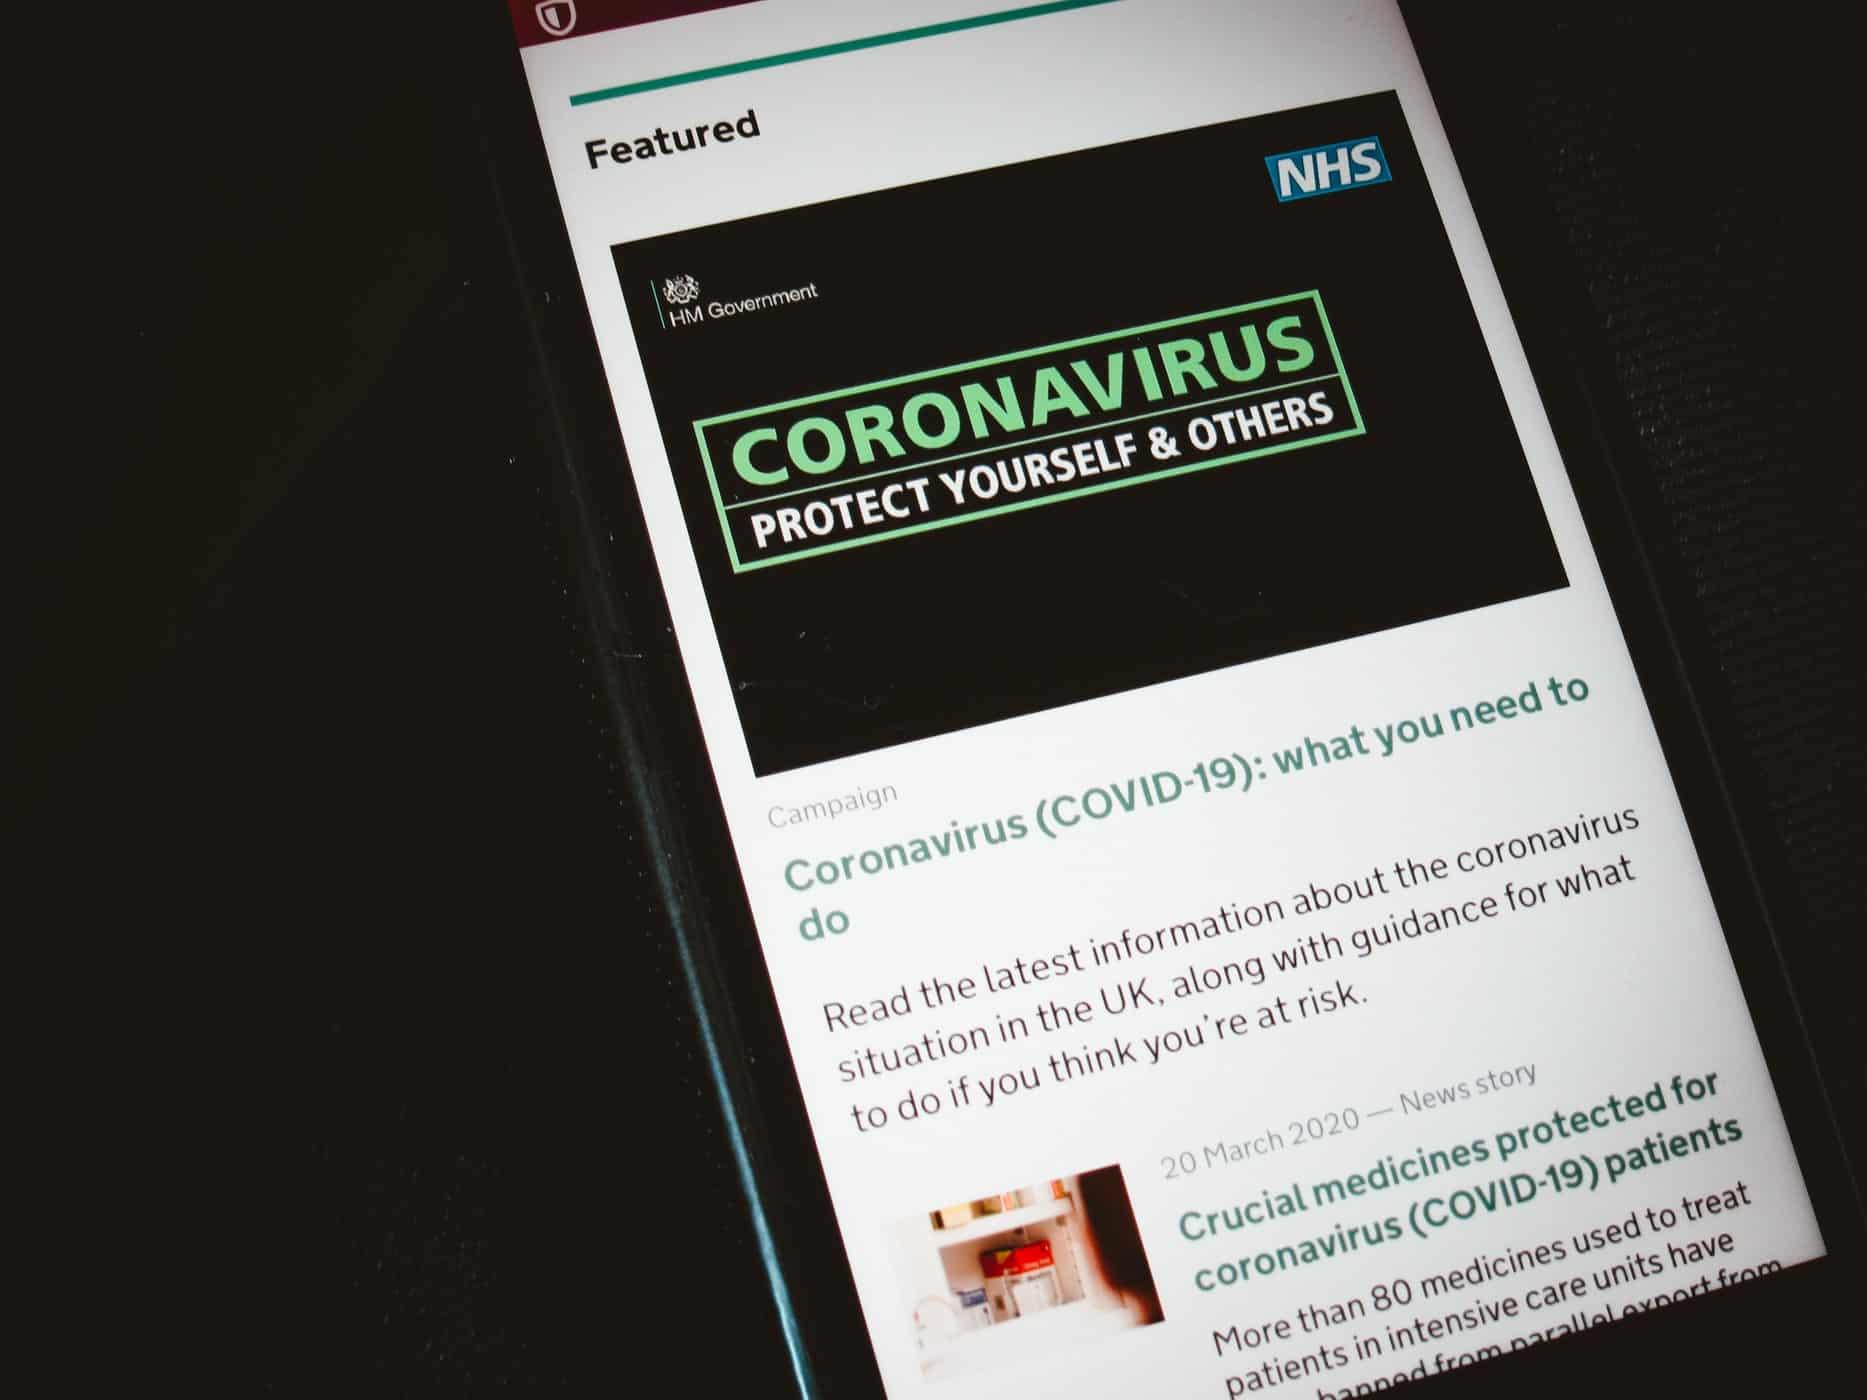 False virus information